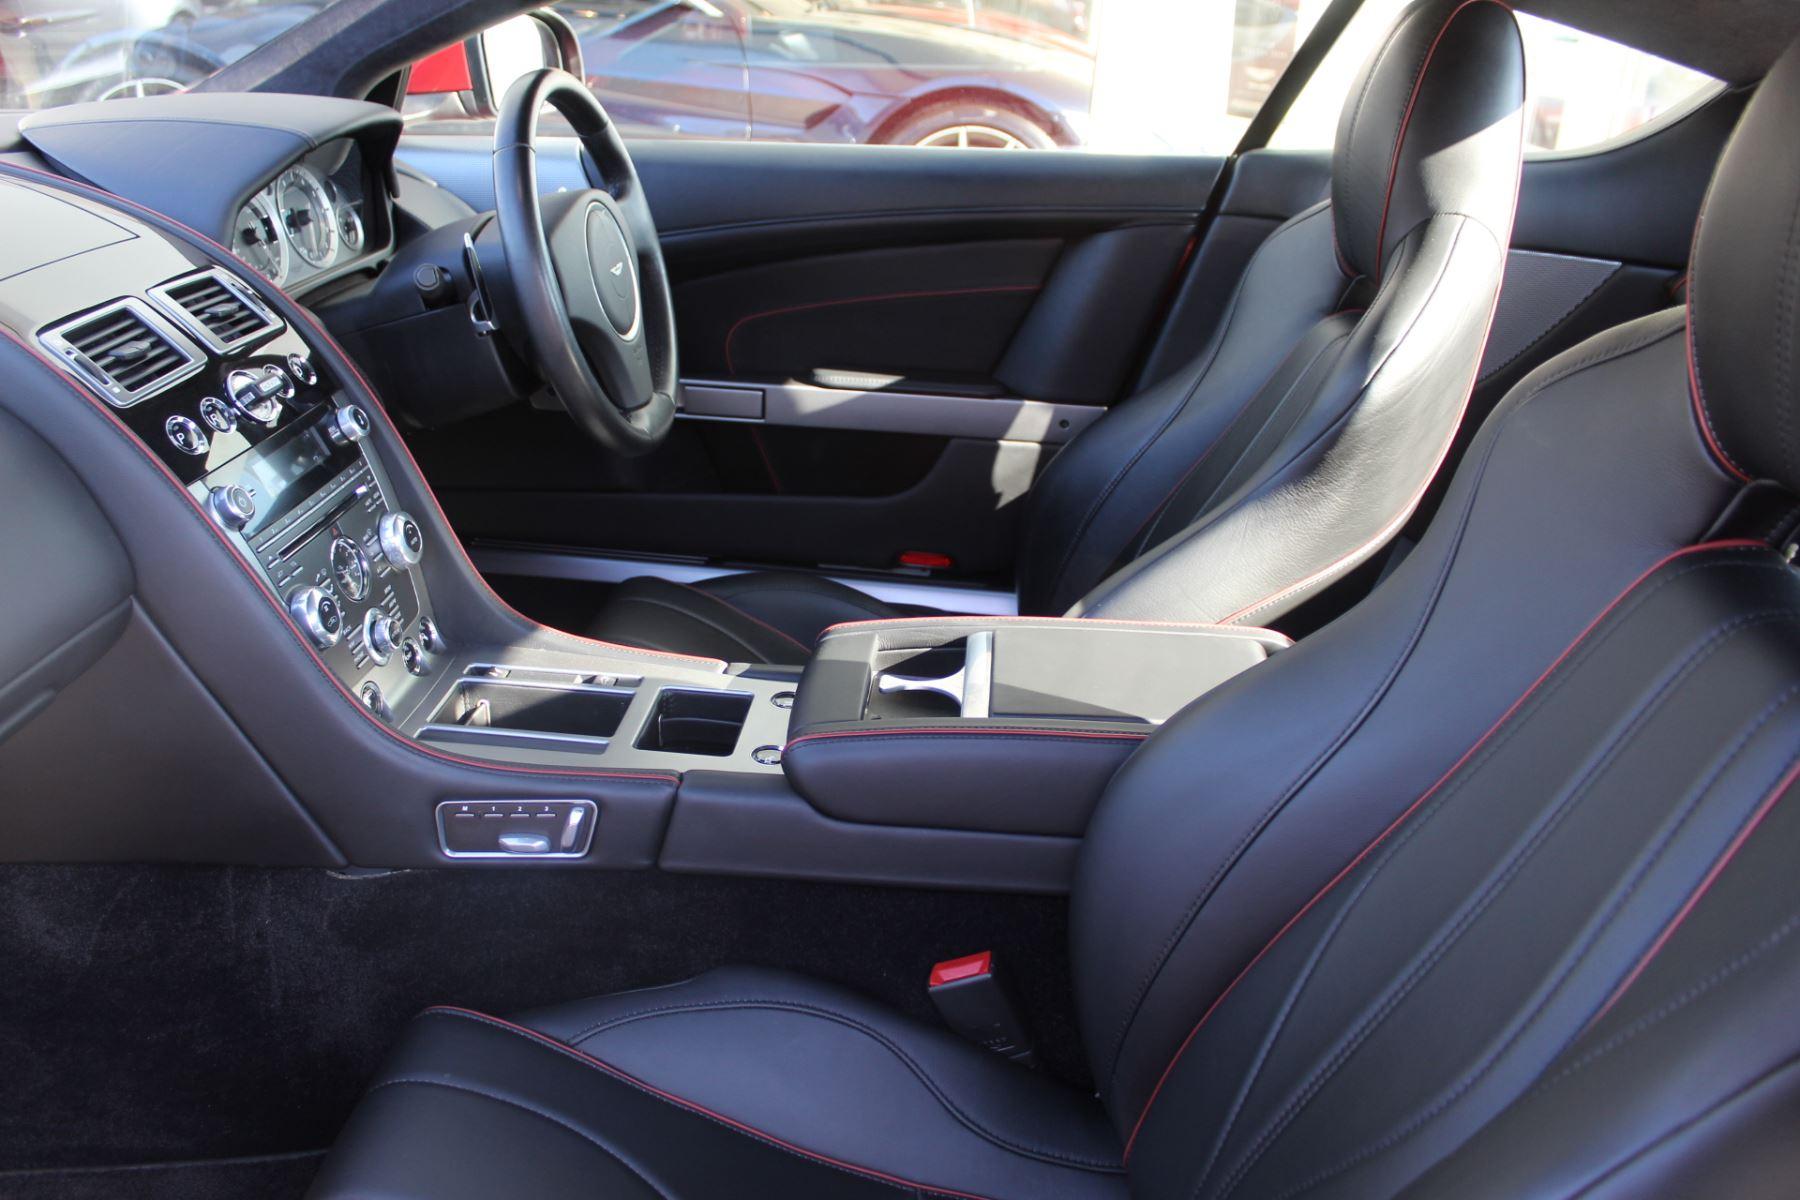 Aston Martin DB9 V12 2dr Touchtronic image 10